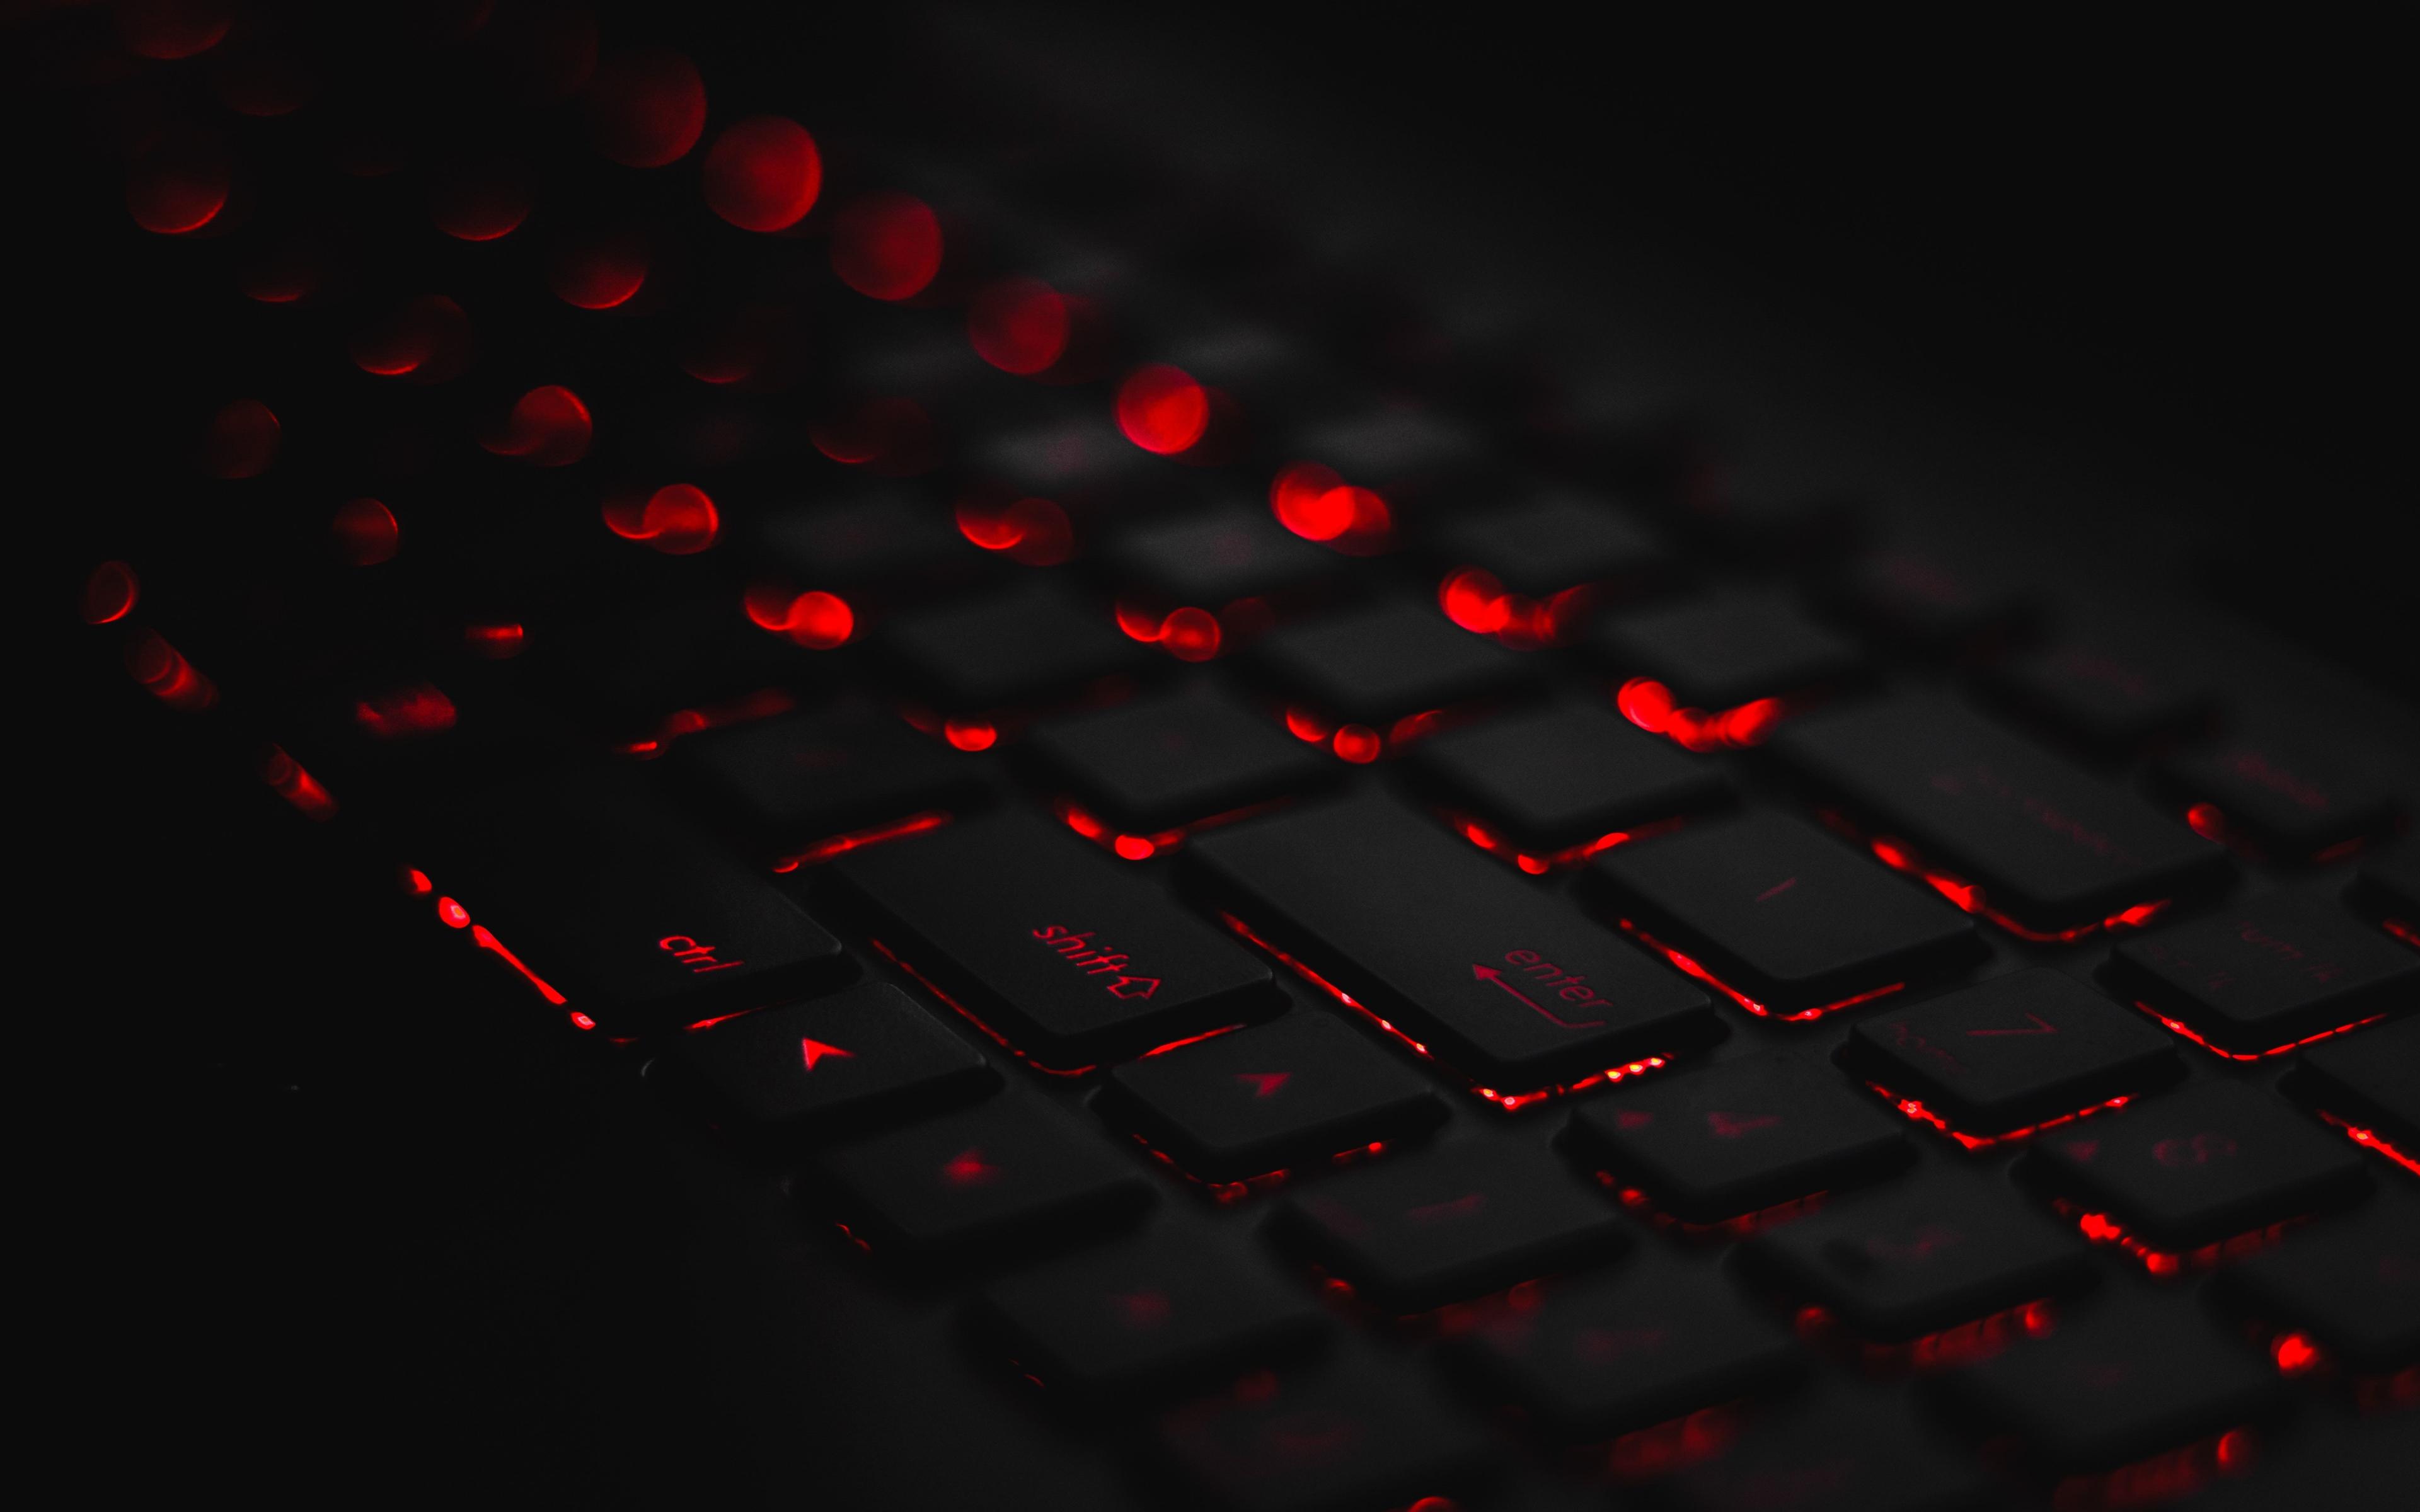 Download 3840x2400 Wallpaper Keyboard Dark Red Glow 4k Ultra Hd 16 10 Widescreen 3840x2400 Hd Image Background 19829